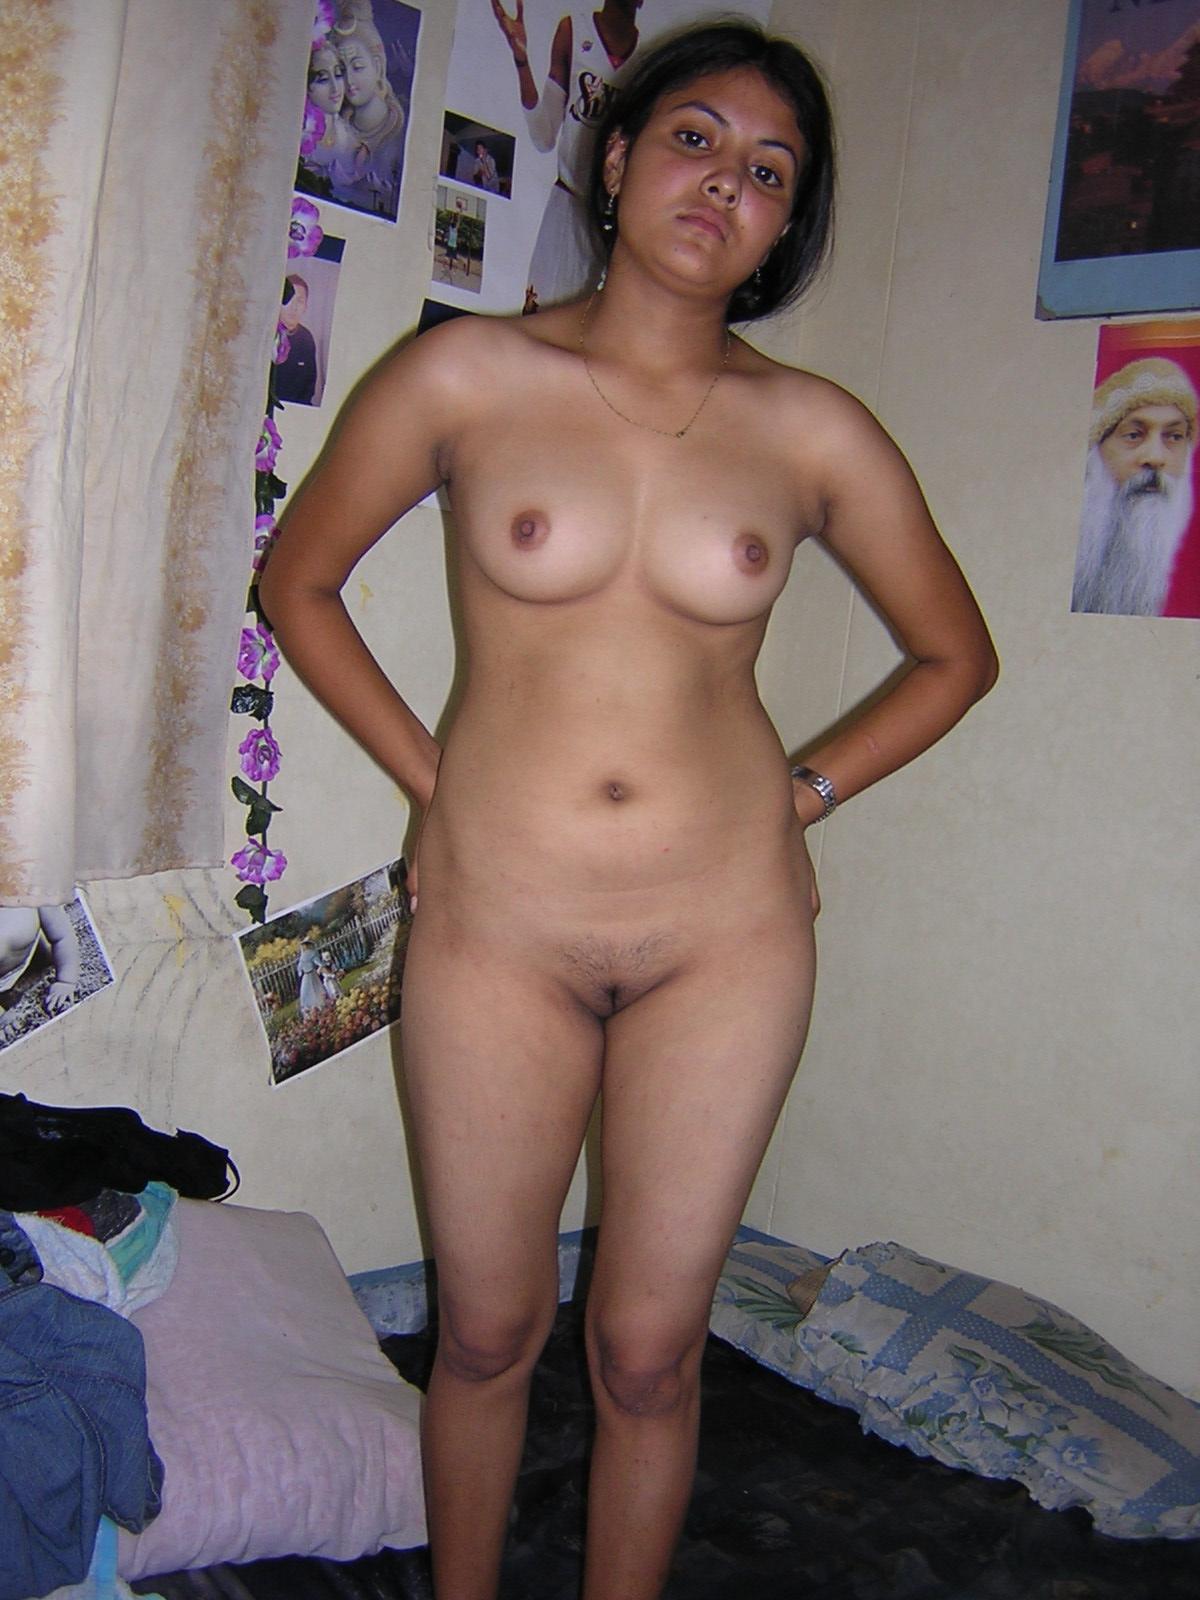 Nude asian girl fucking banana